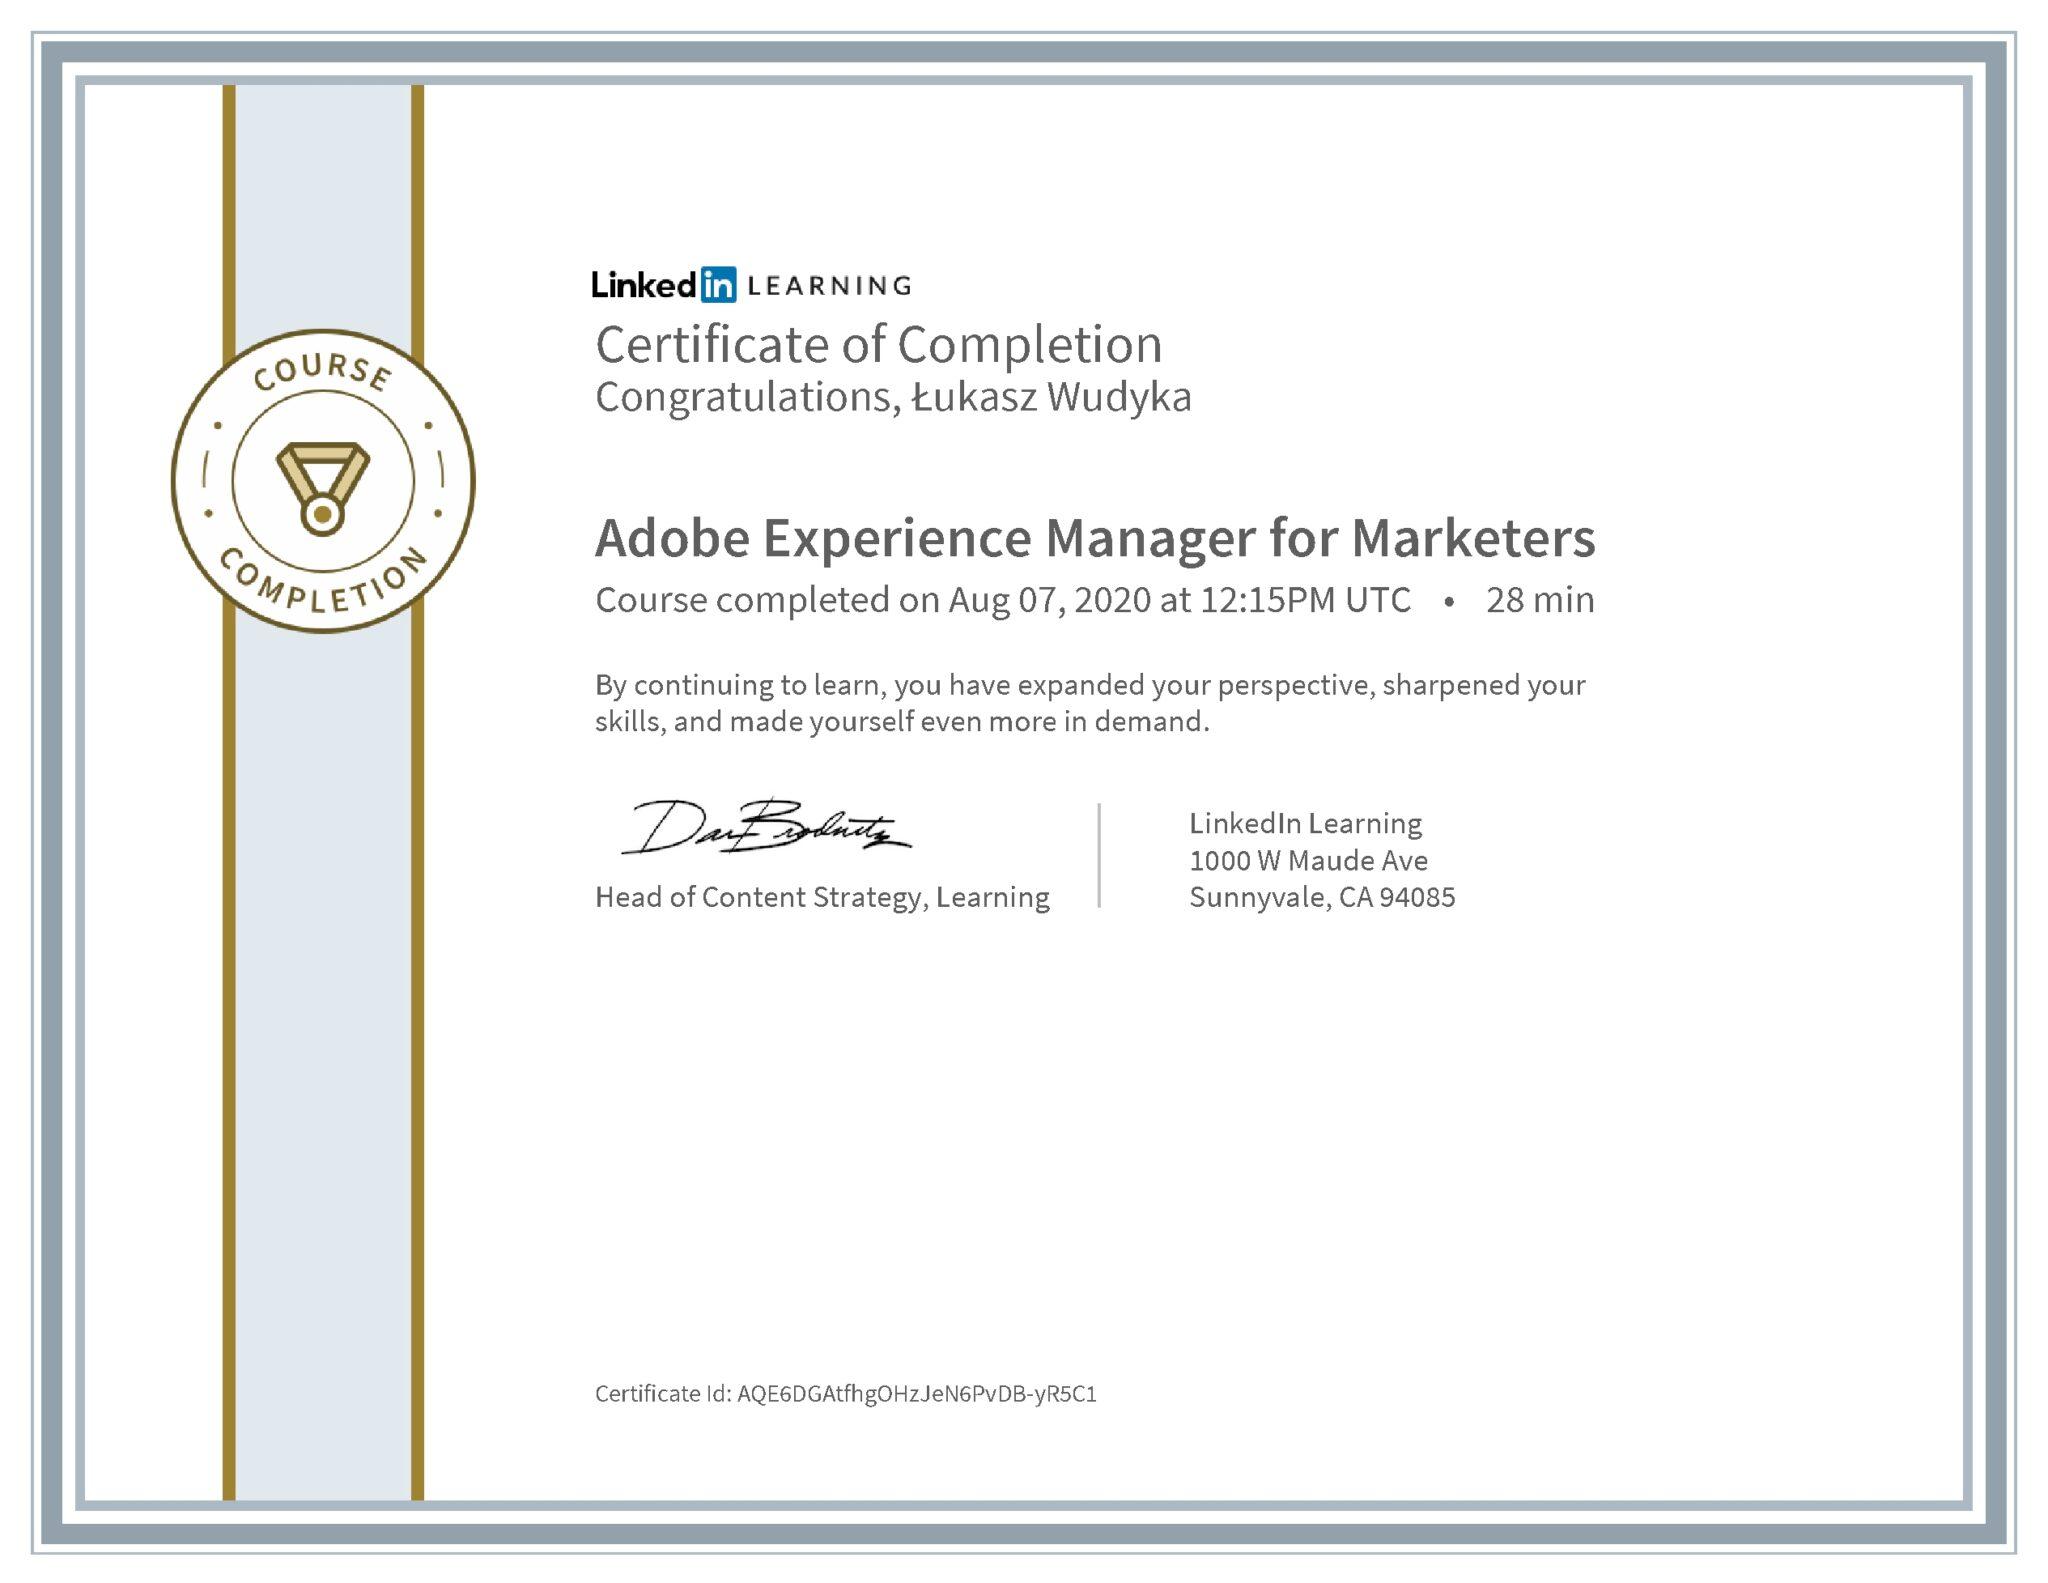 Łukasz Wudyka certyfikat LinkedIn Adobe Experience Manager for Marketers